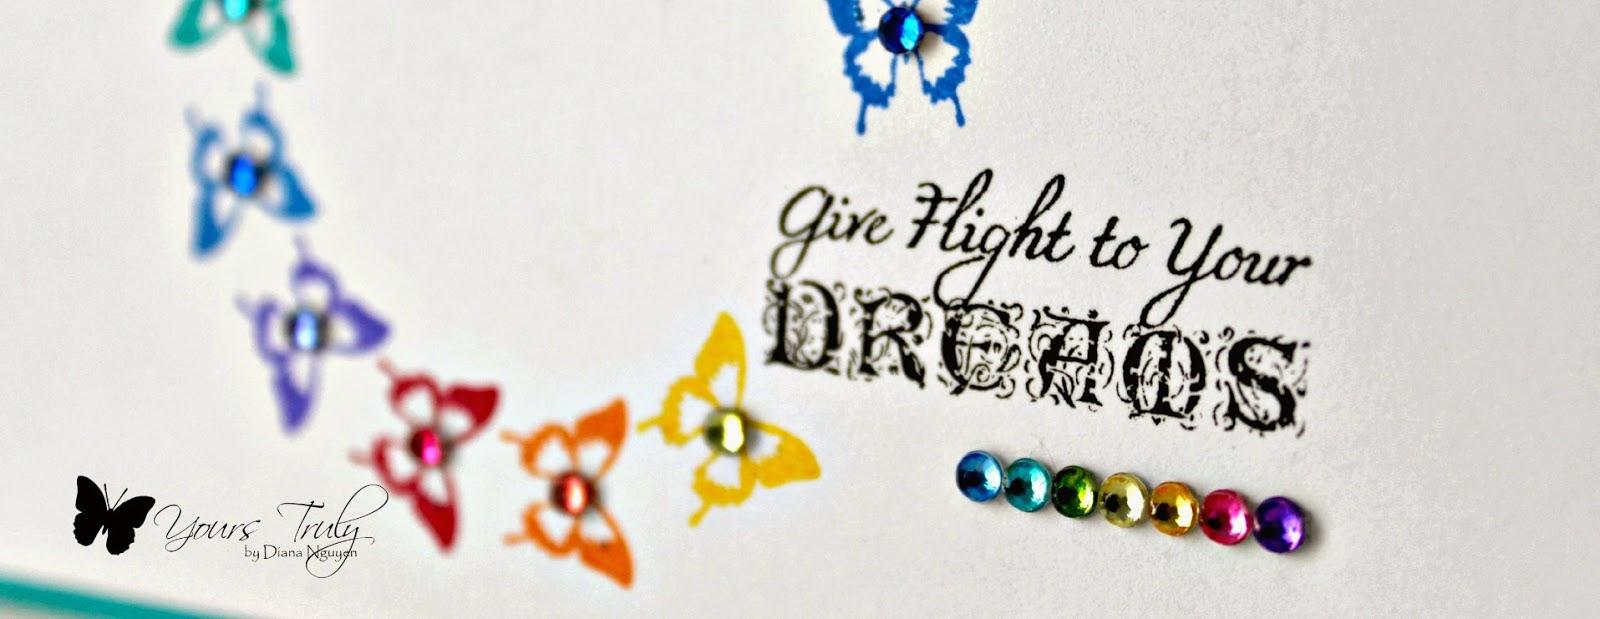 Diana Nguyen, JustRite, CAS, butterfly, handmade cards